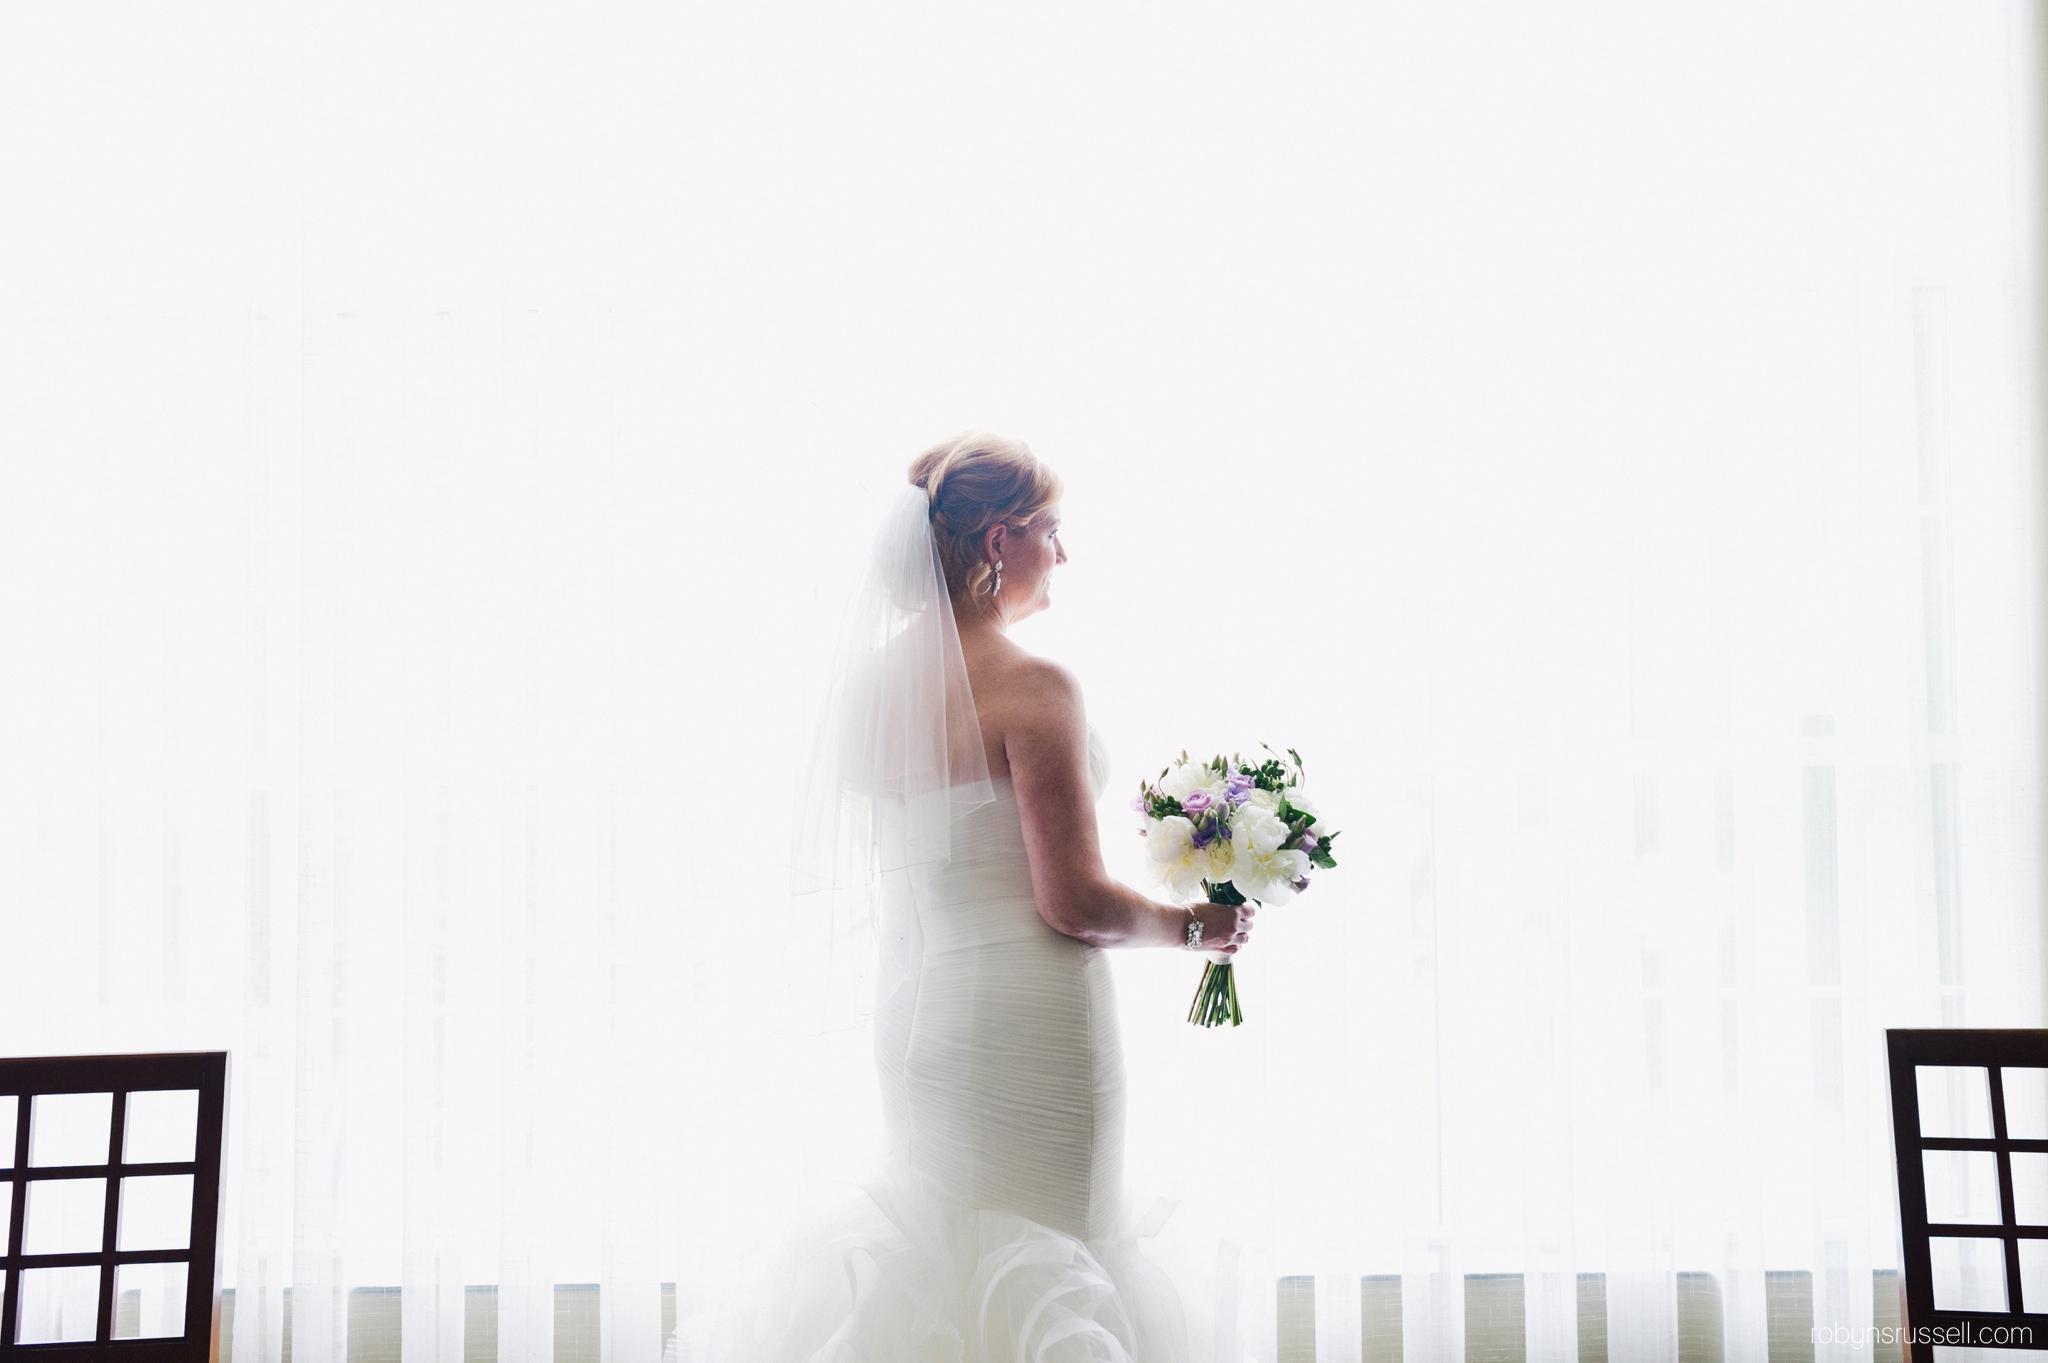 11-bride-by-window-dramatic-portrait-oakville-hotel-staybridge-suites.jpg